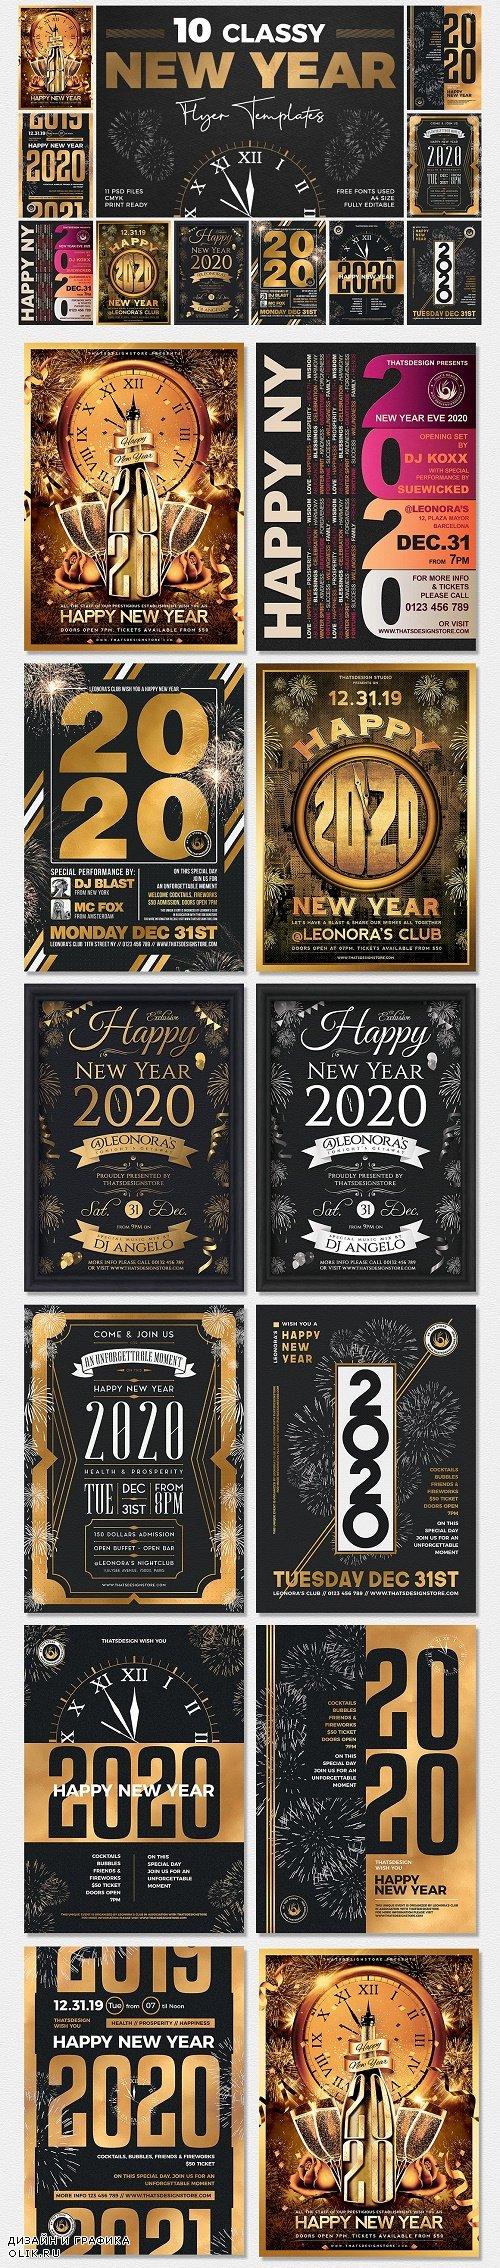 10 New Year Flyer Bundle - 4197215